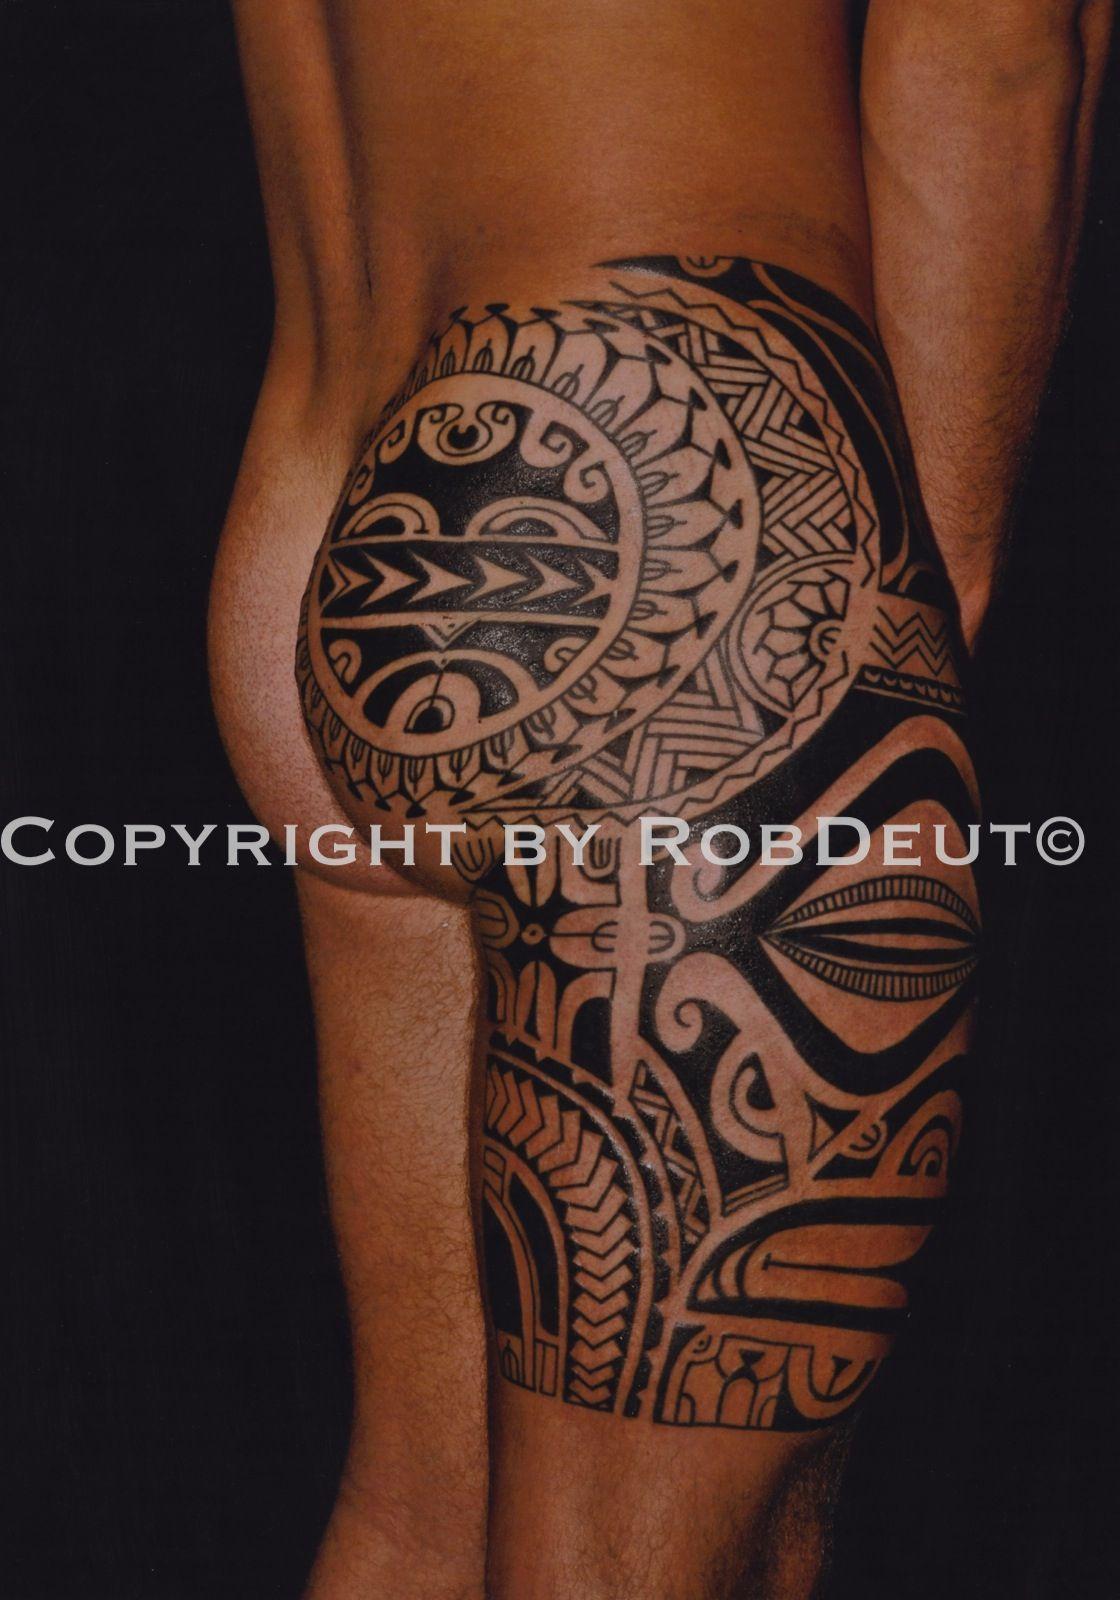 sélection tatouage maori jambe - page 3 sur 3 - justeuntattoo